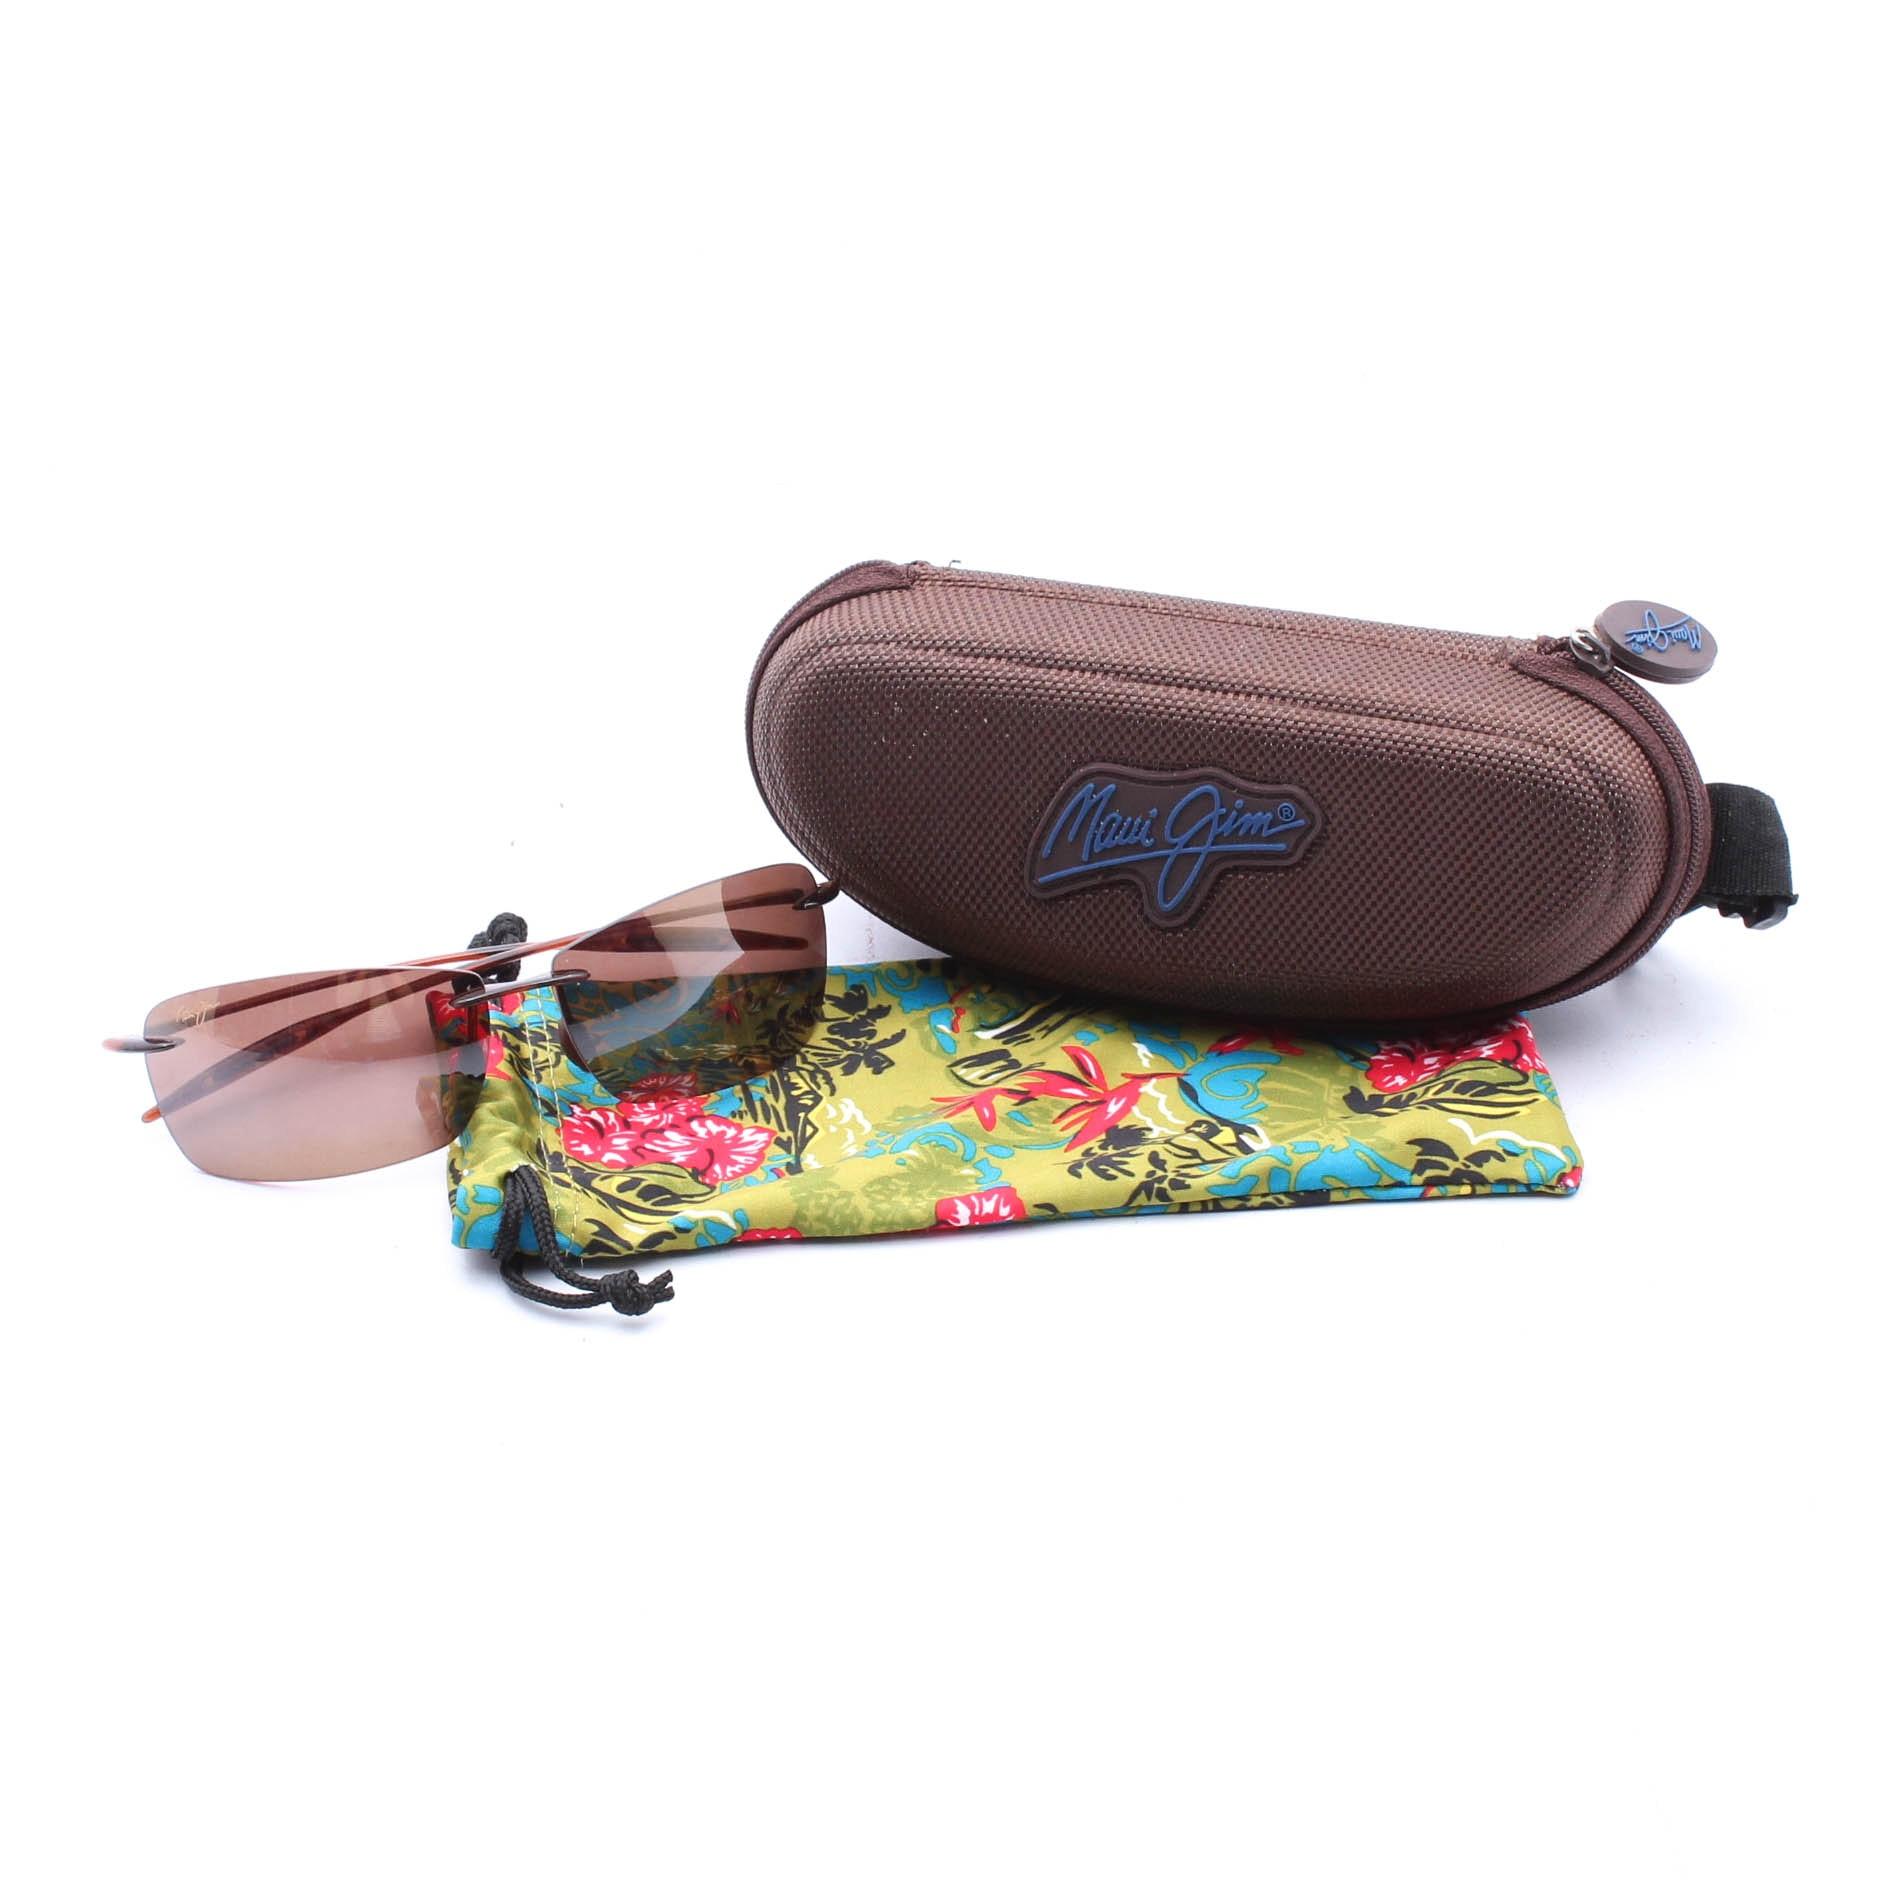 Maui Jim Lighthouse-423 Sunglasses with Case